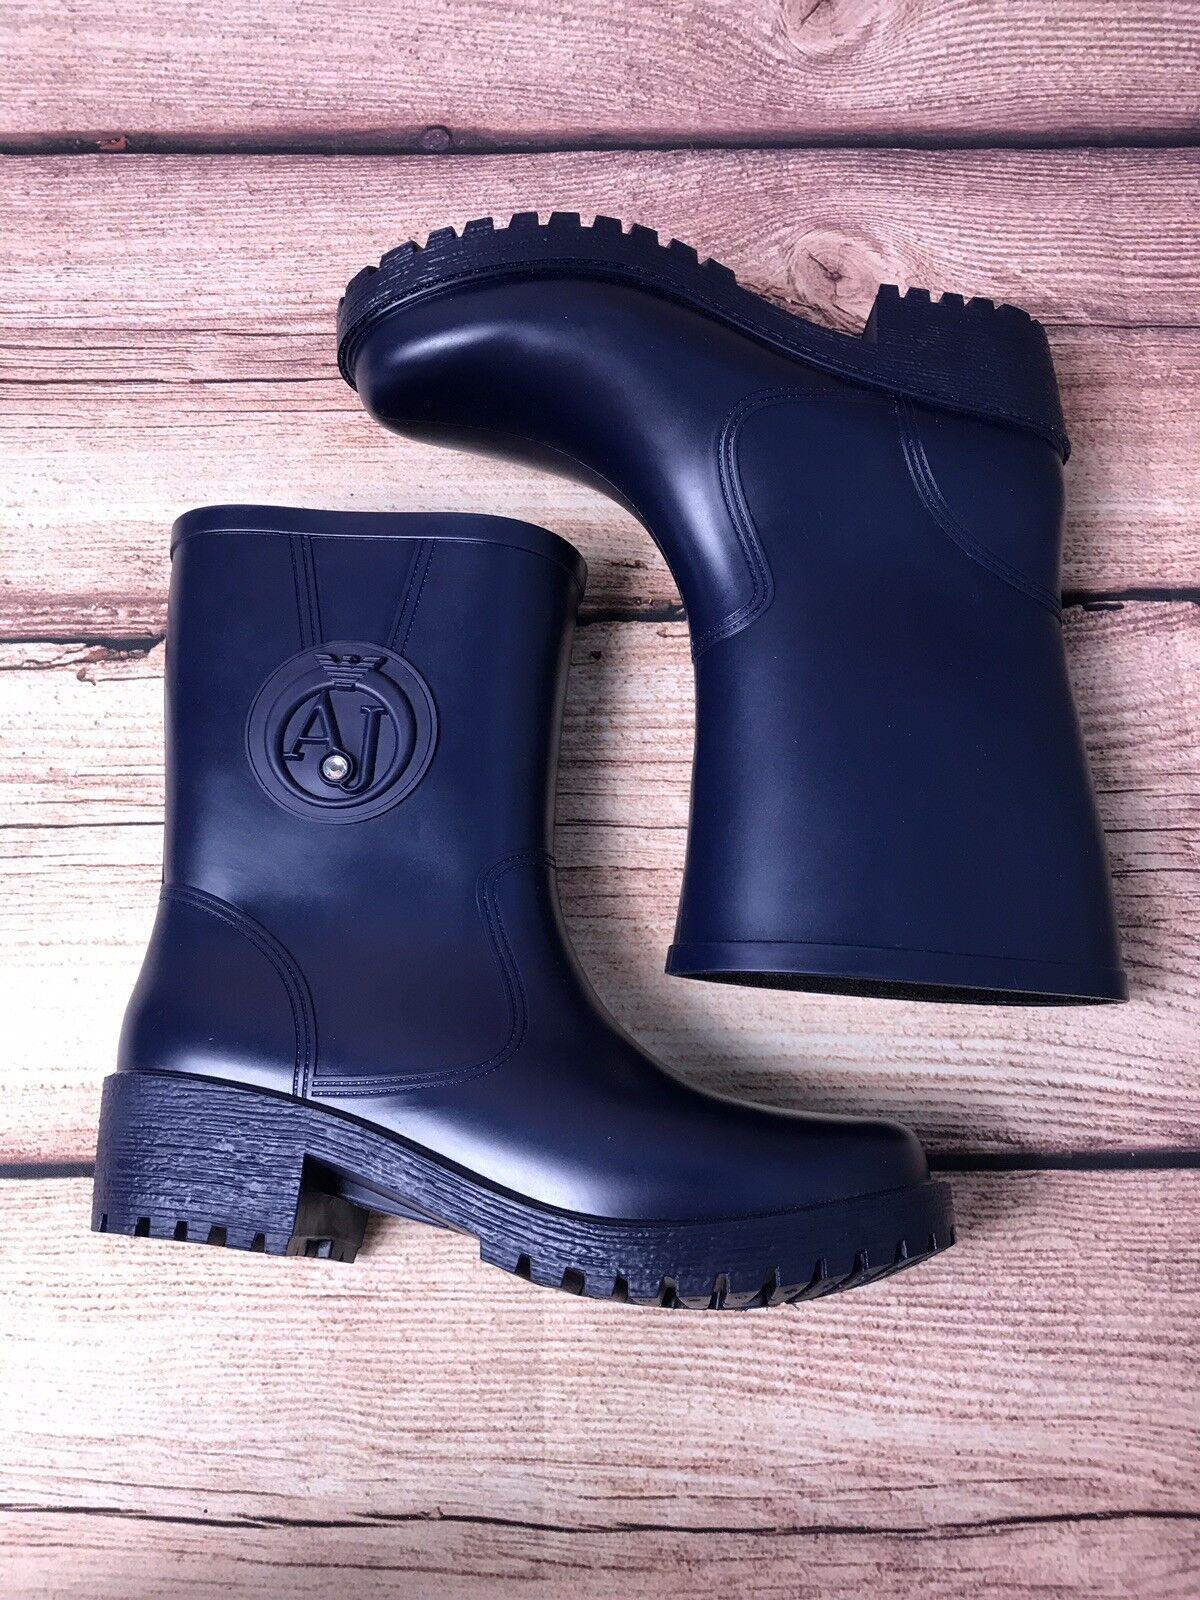 Armani Jeans Navy Rain Boots Size 38